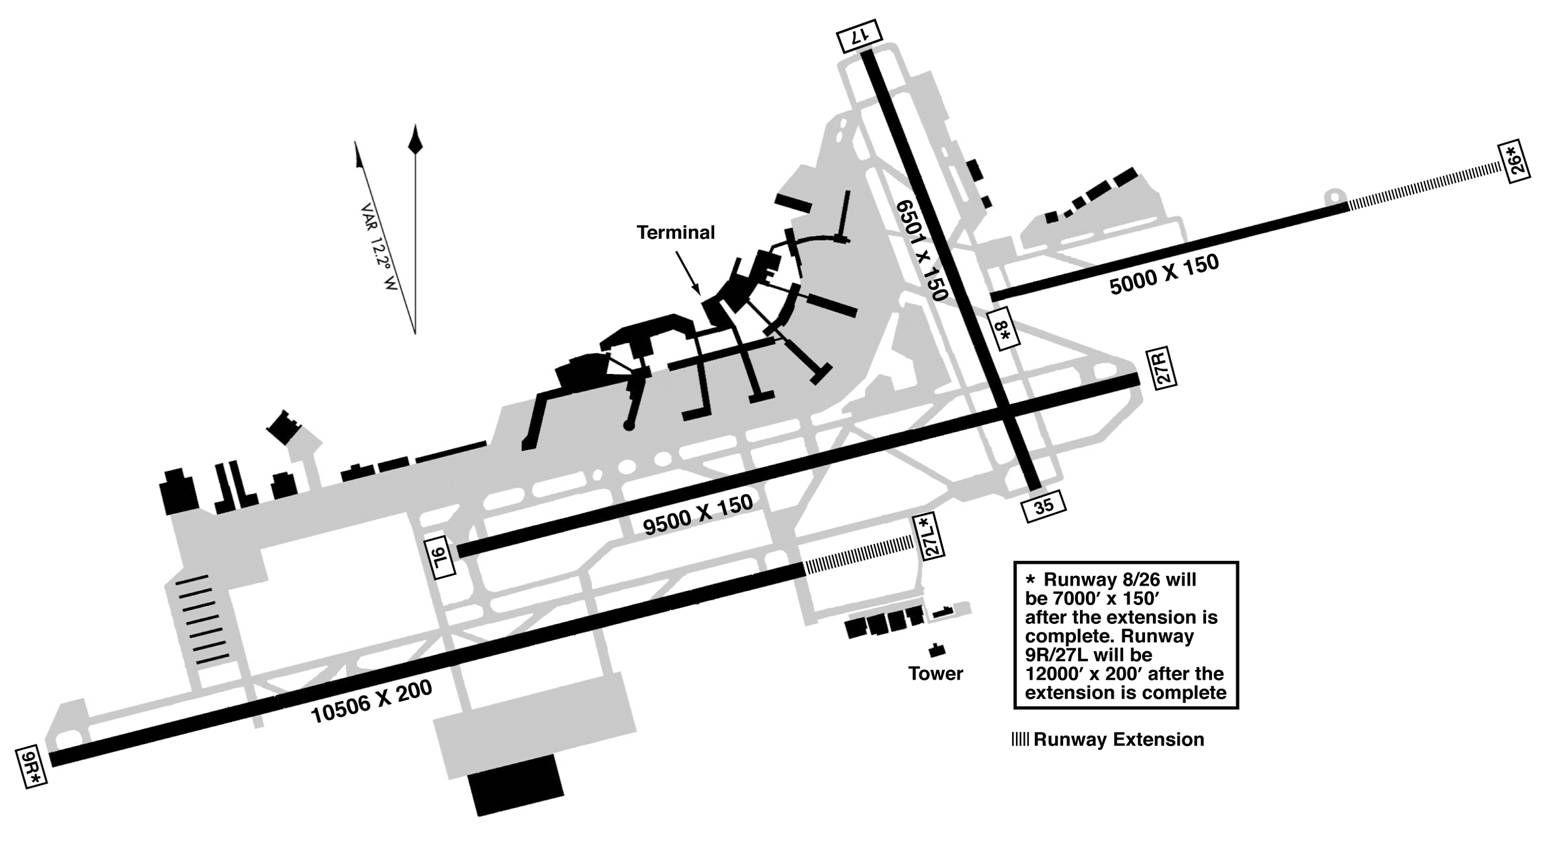 philadelphia international airport map vacation all i ever